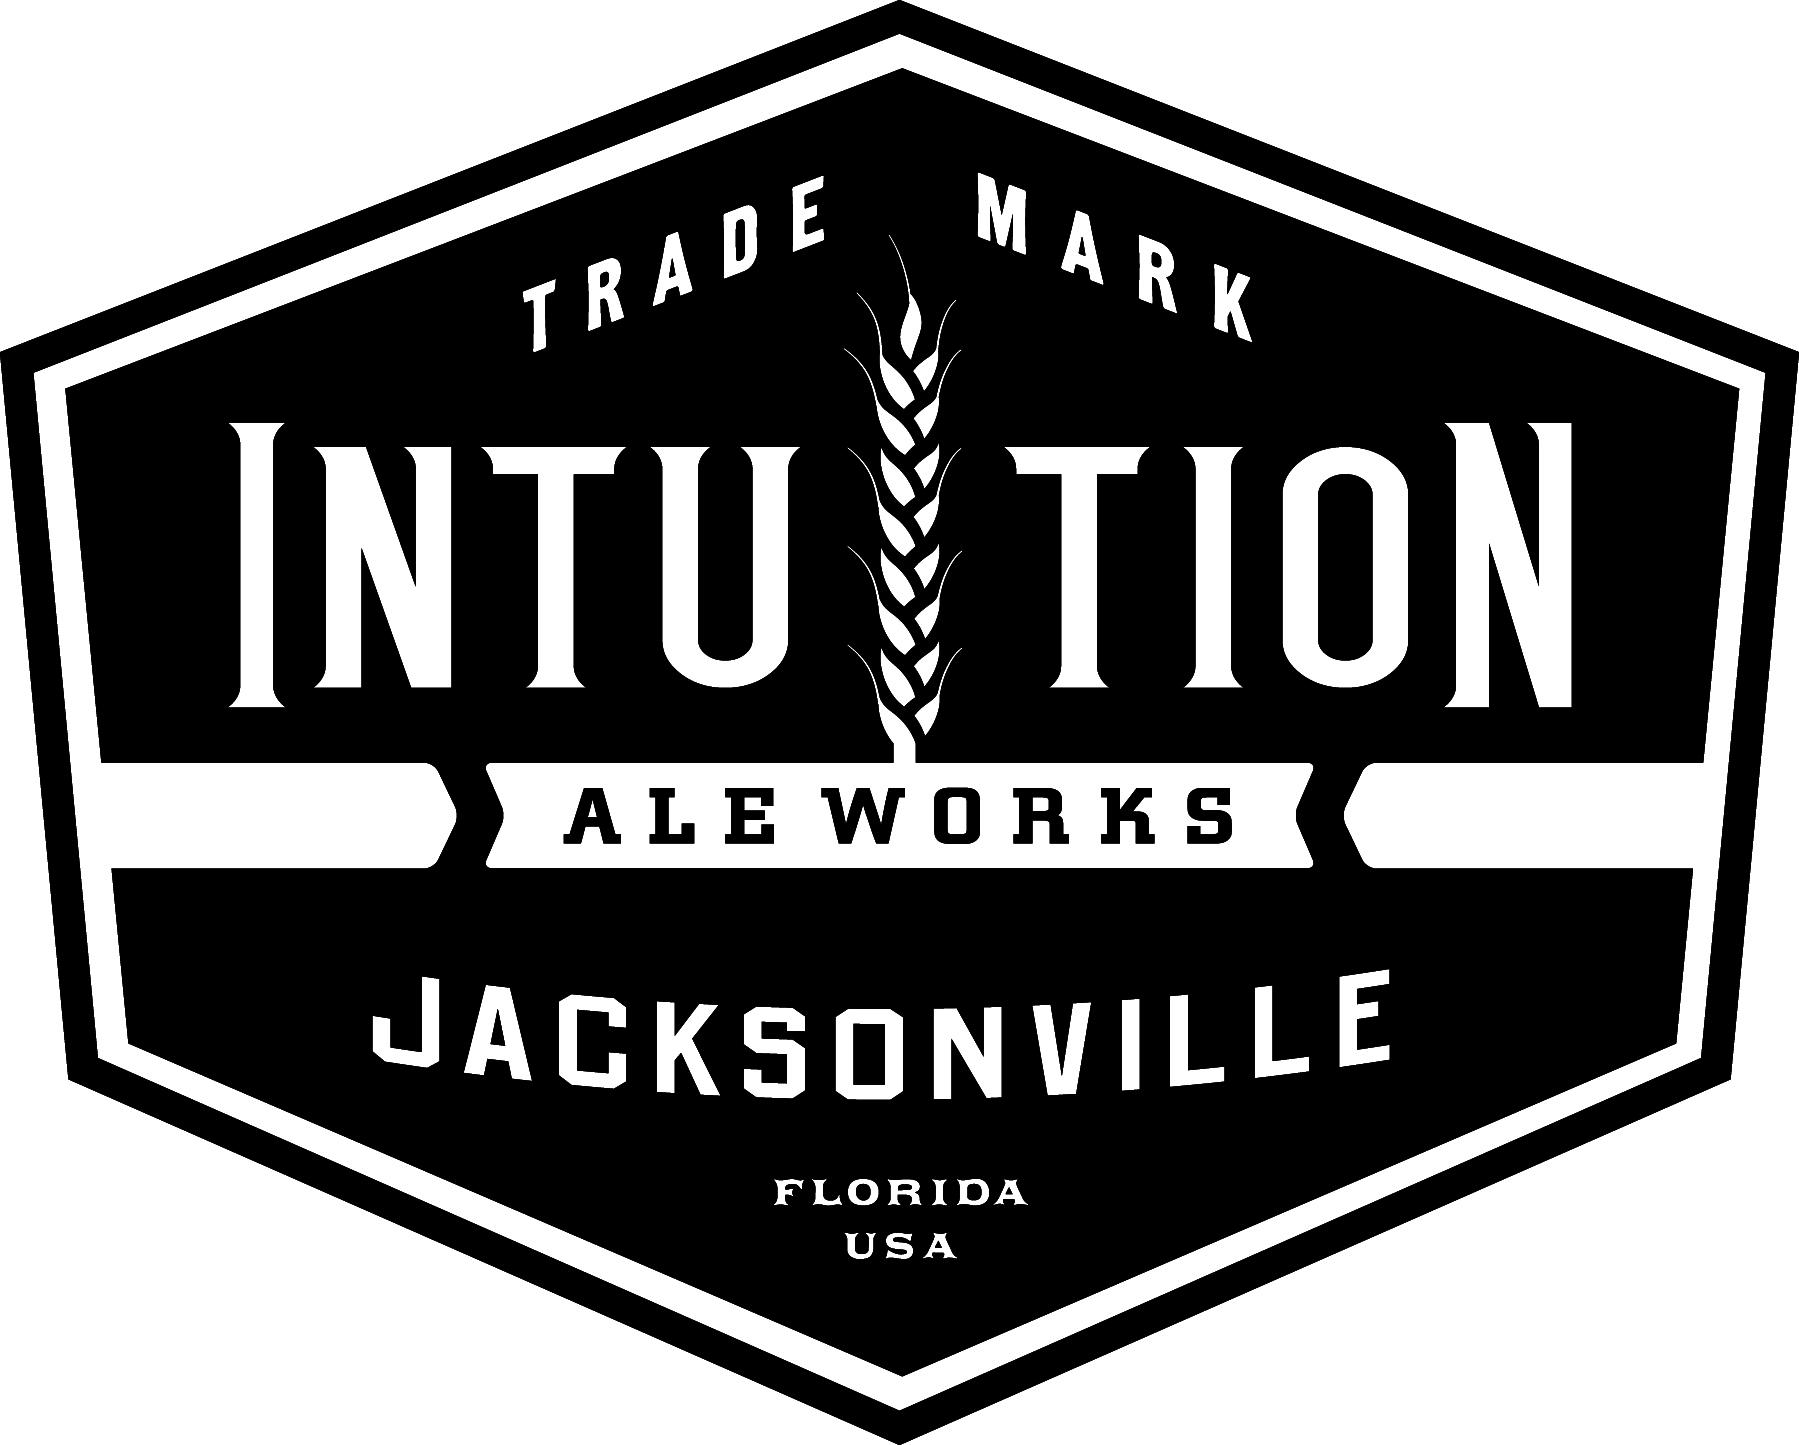 Intuition logo.jpg